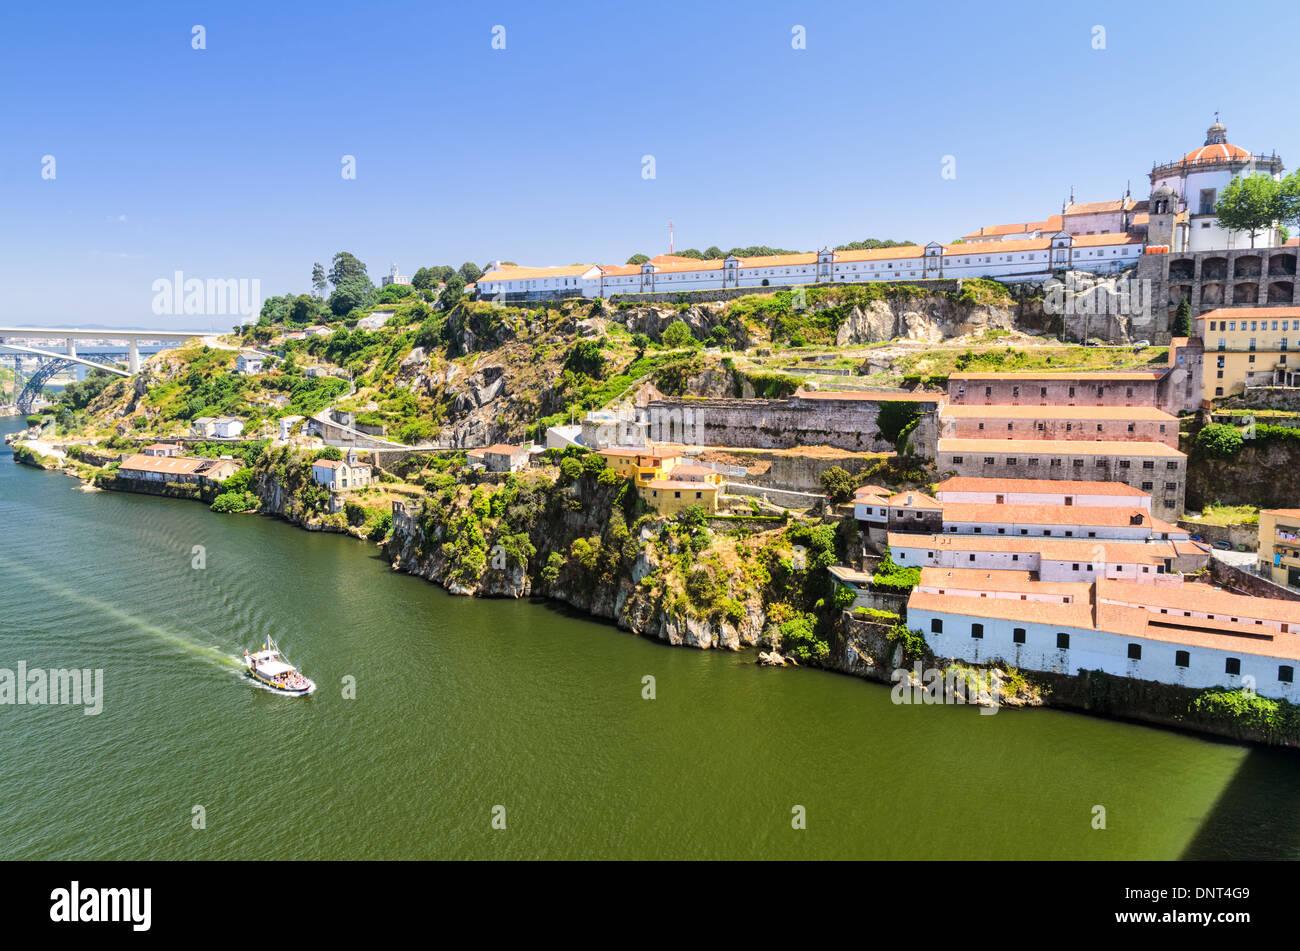 Douro river and wine cellars of Porto, Portugal - Stock Image